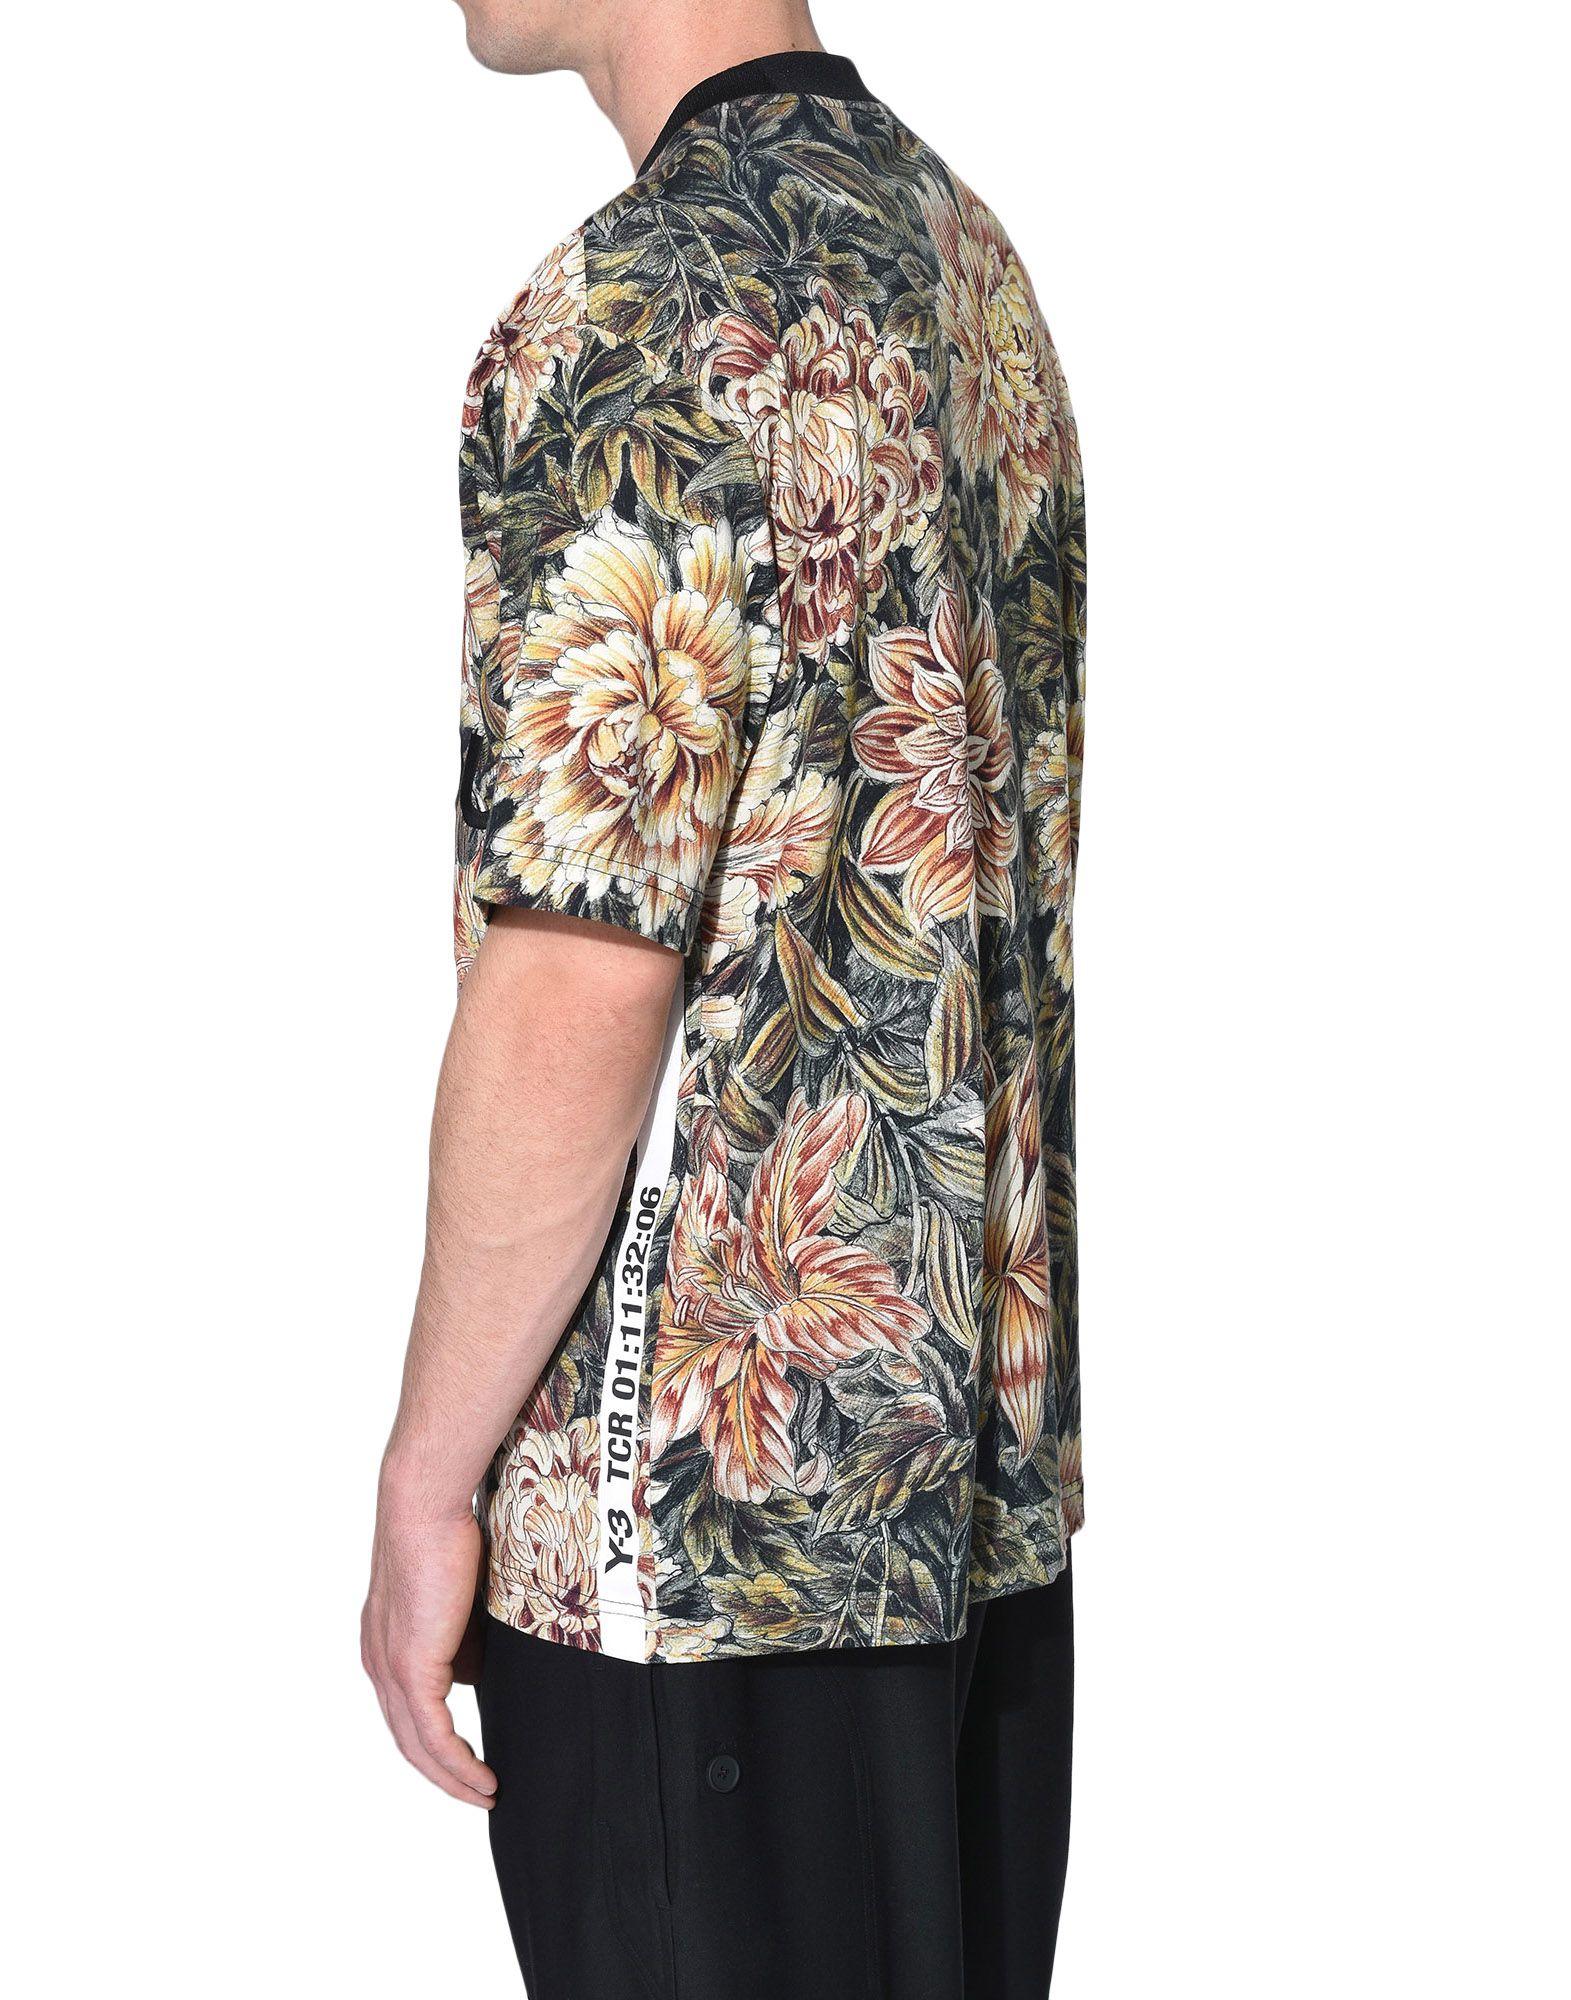 Y-3 Y-3 AOP High Neck Tee Short sleeve t-shirt Man e